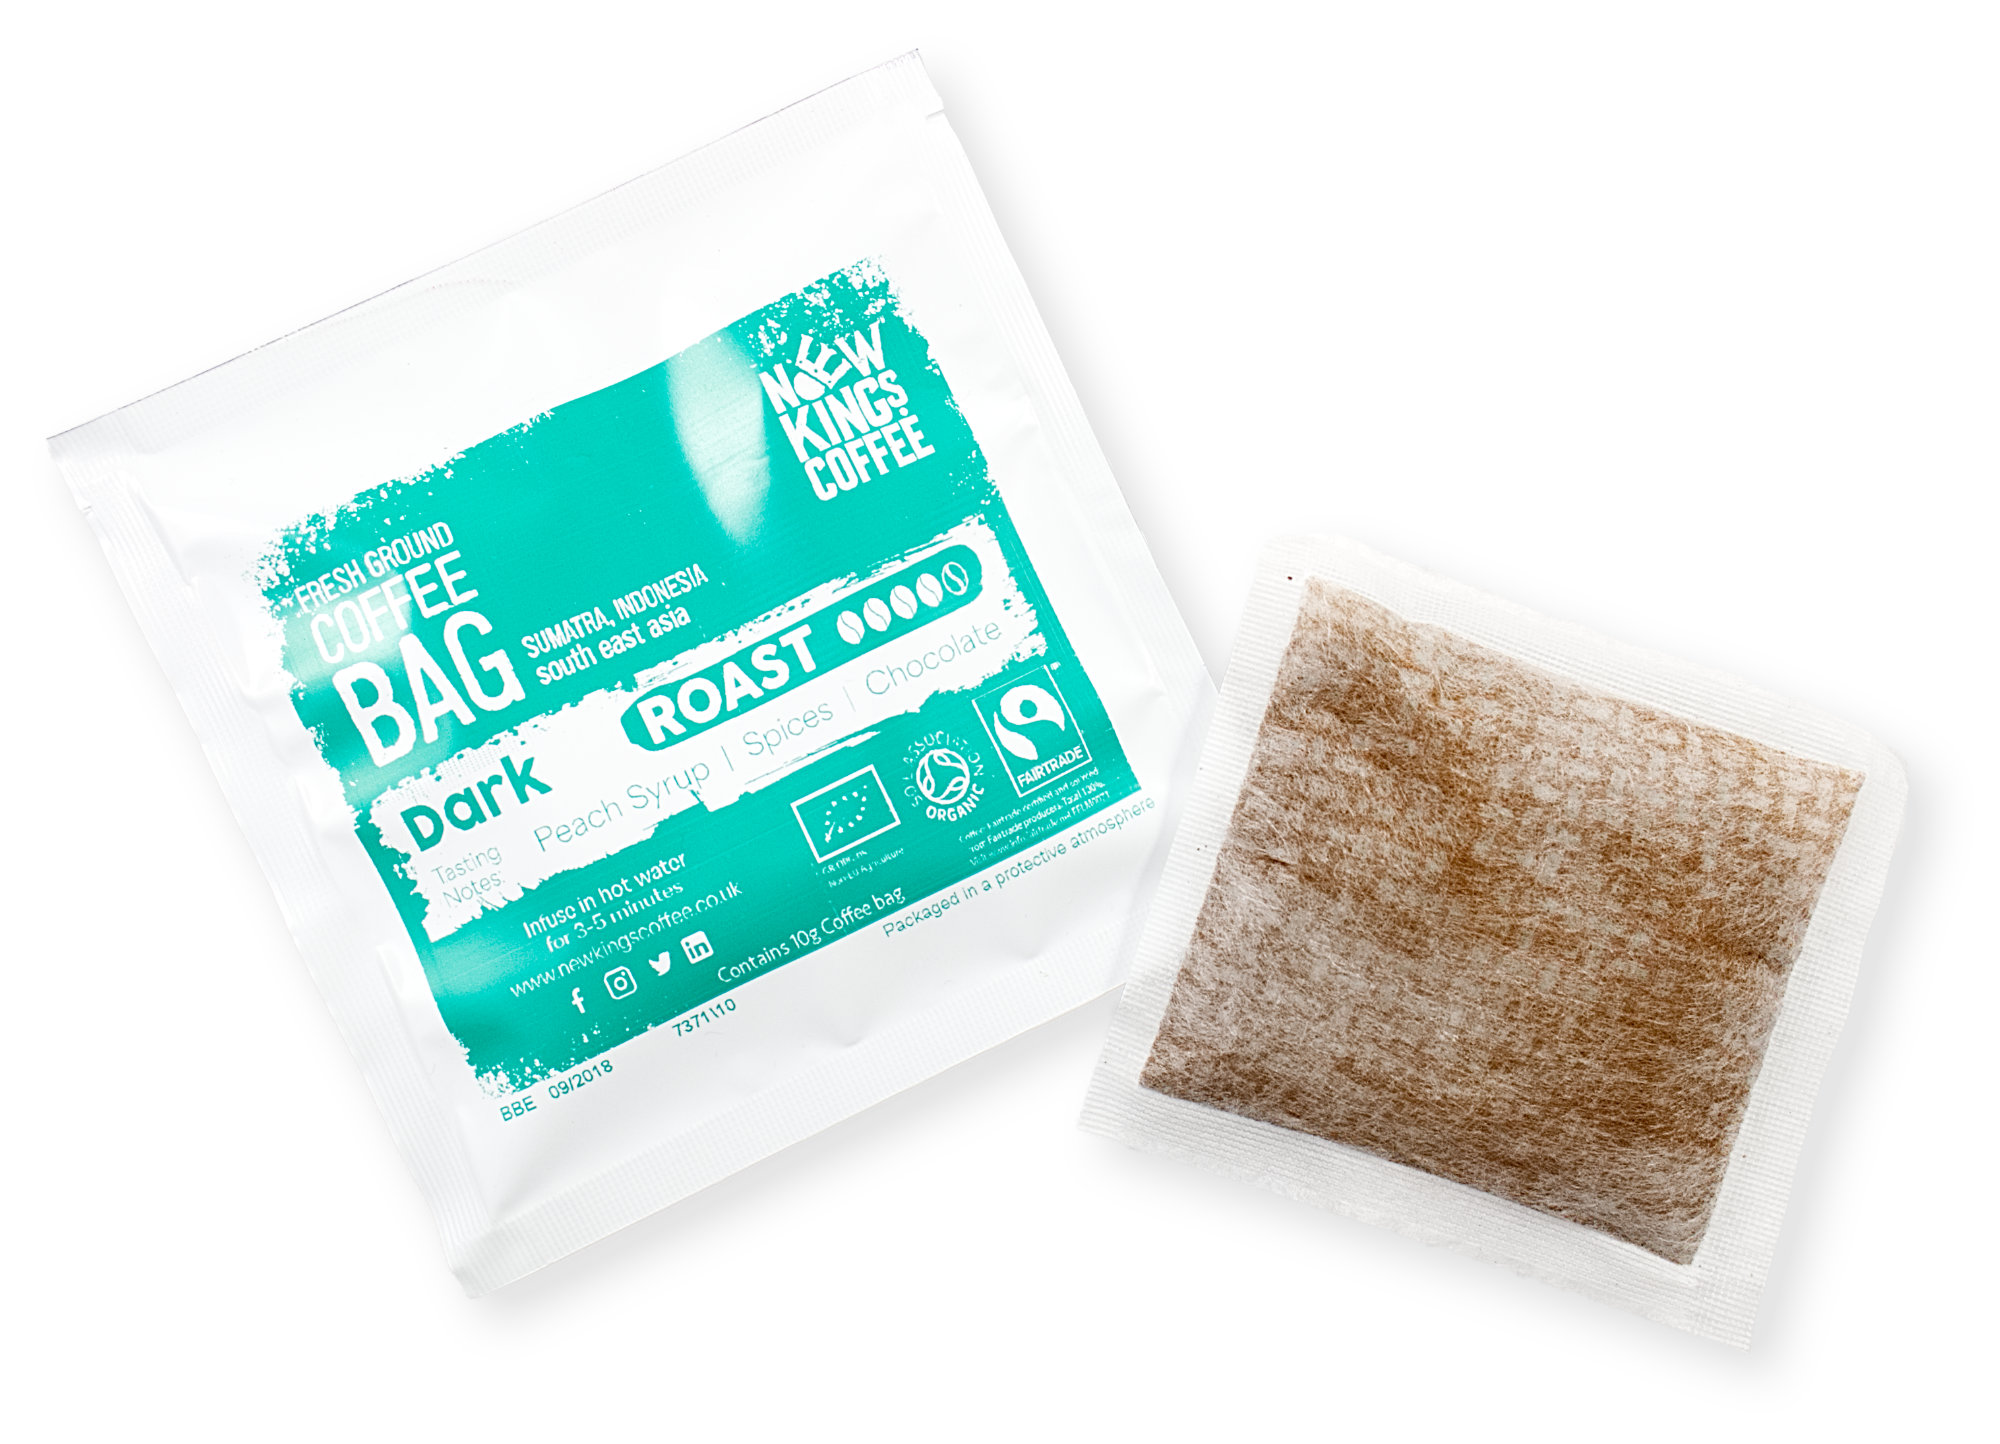 New-Kings-Coffee-Bags-Fairtrade-Organic-Sumatra-foil-and-bag.jpg